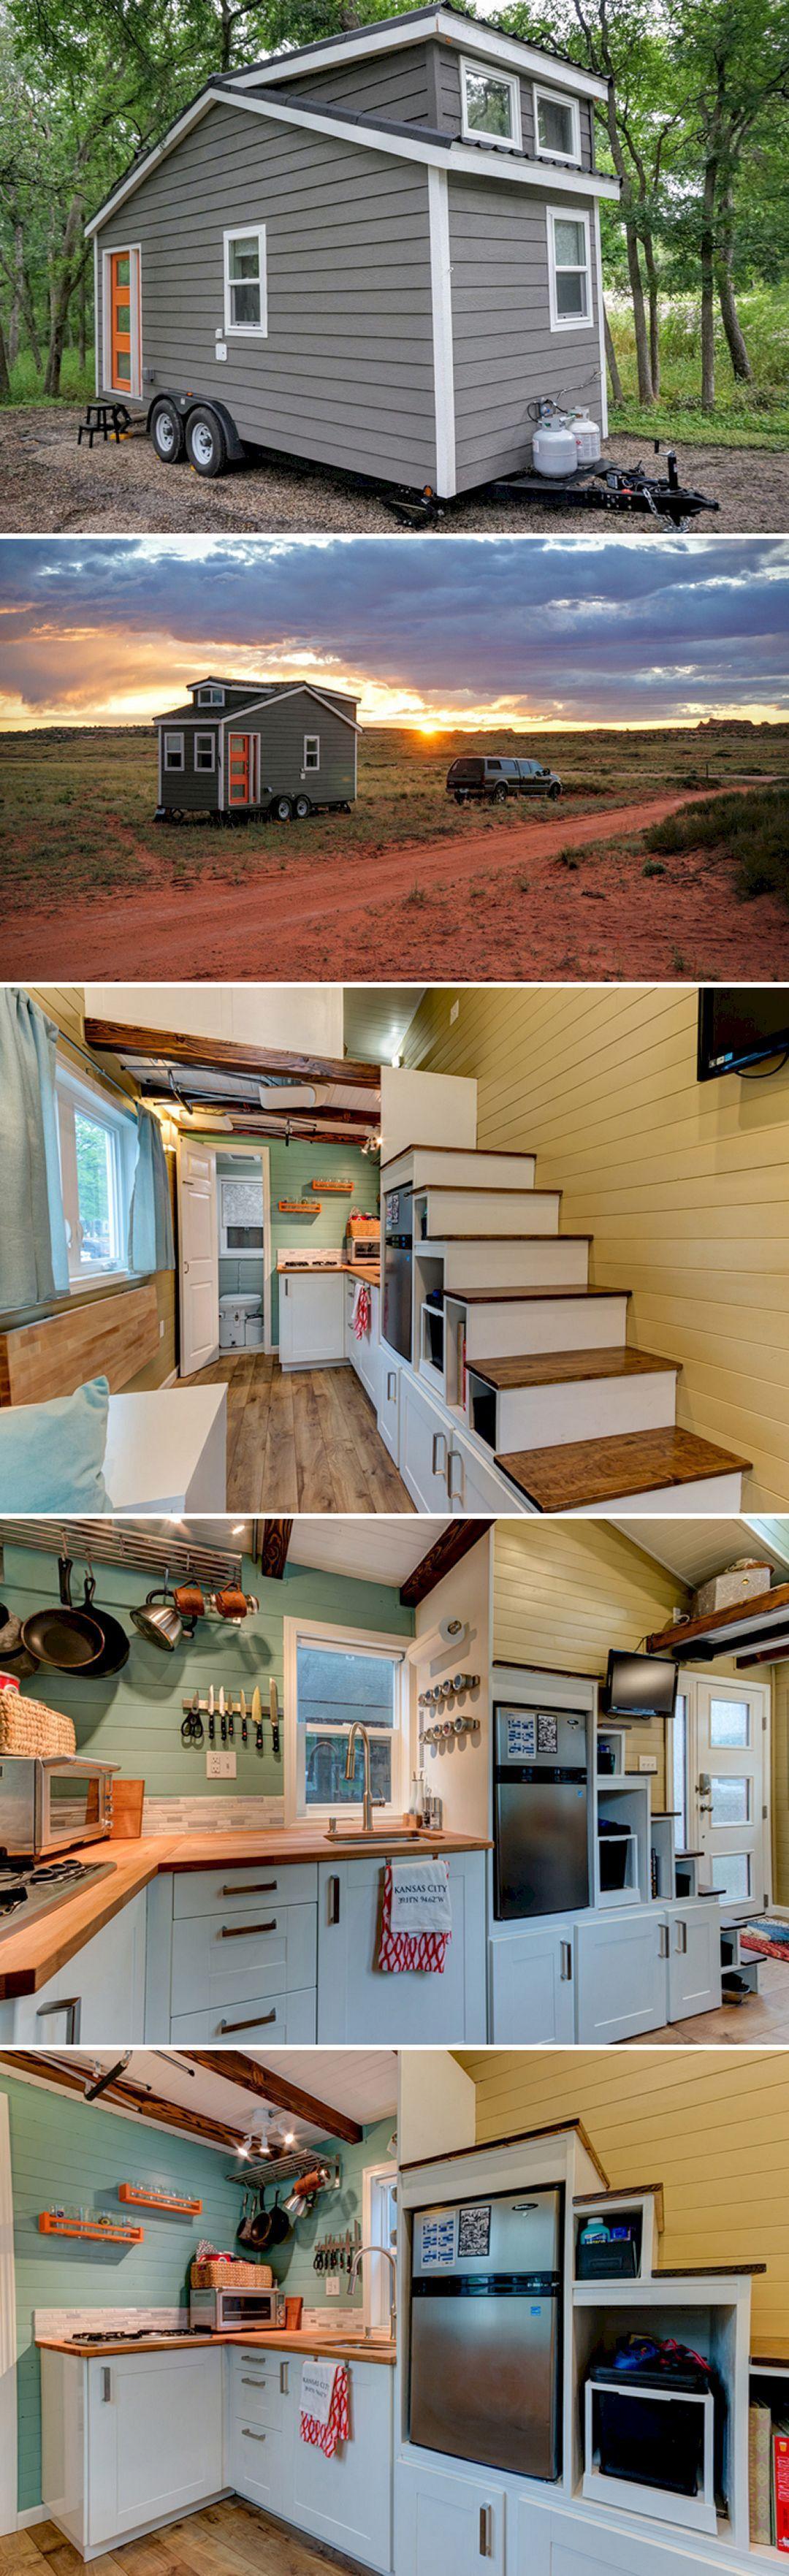 Tiny house plans Stunning Tiny House on